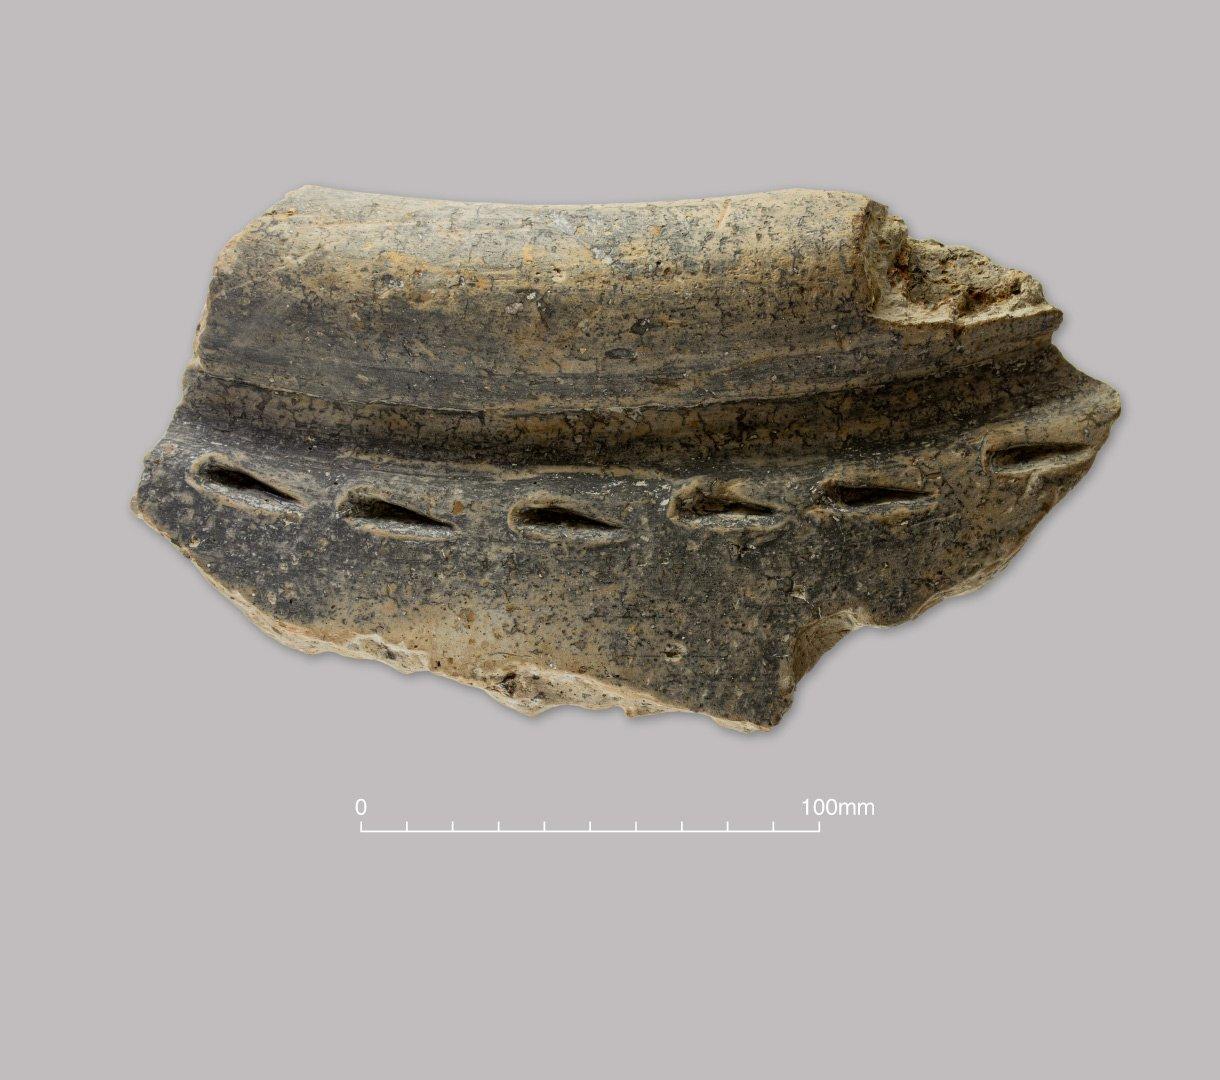 Grog-tempered greyware  large storage jar. Early Roman (c. 50–150 AD)